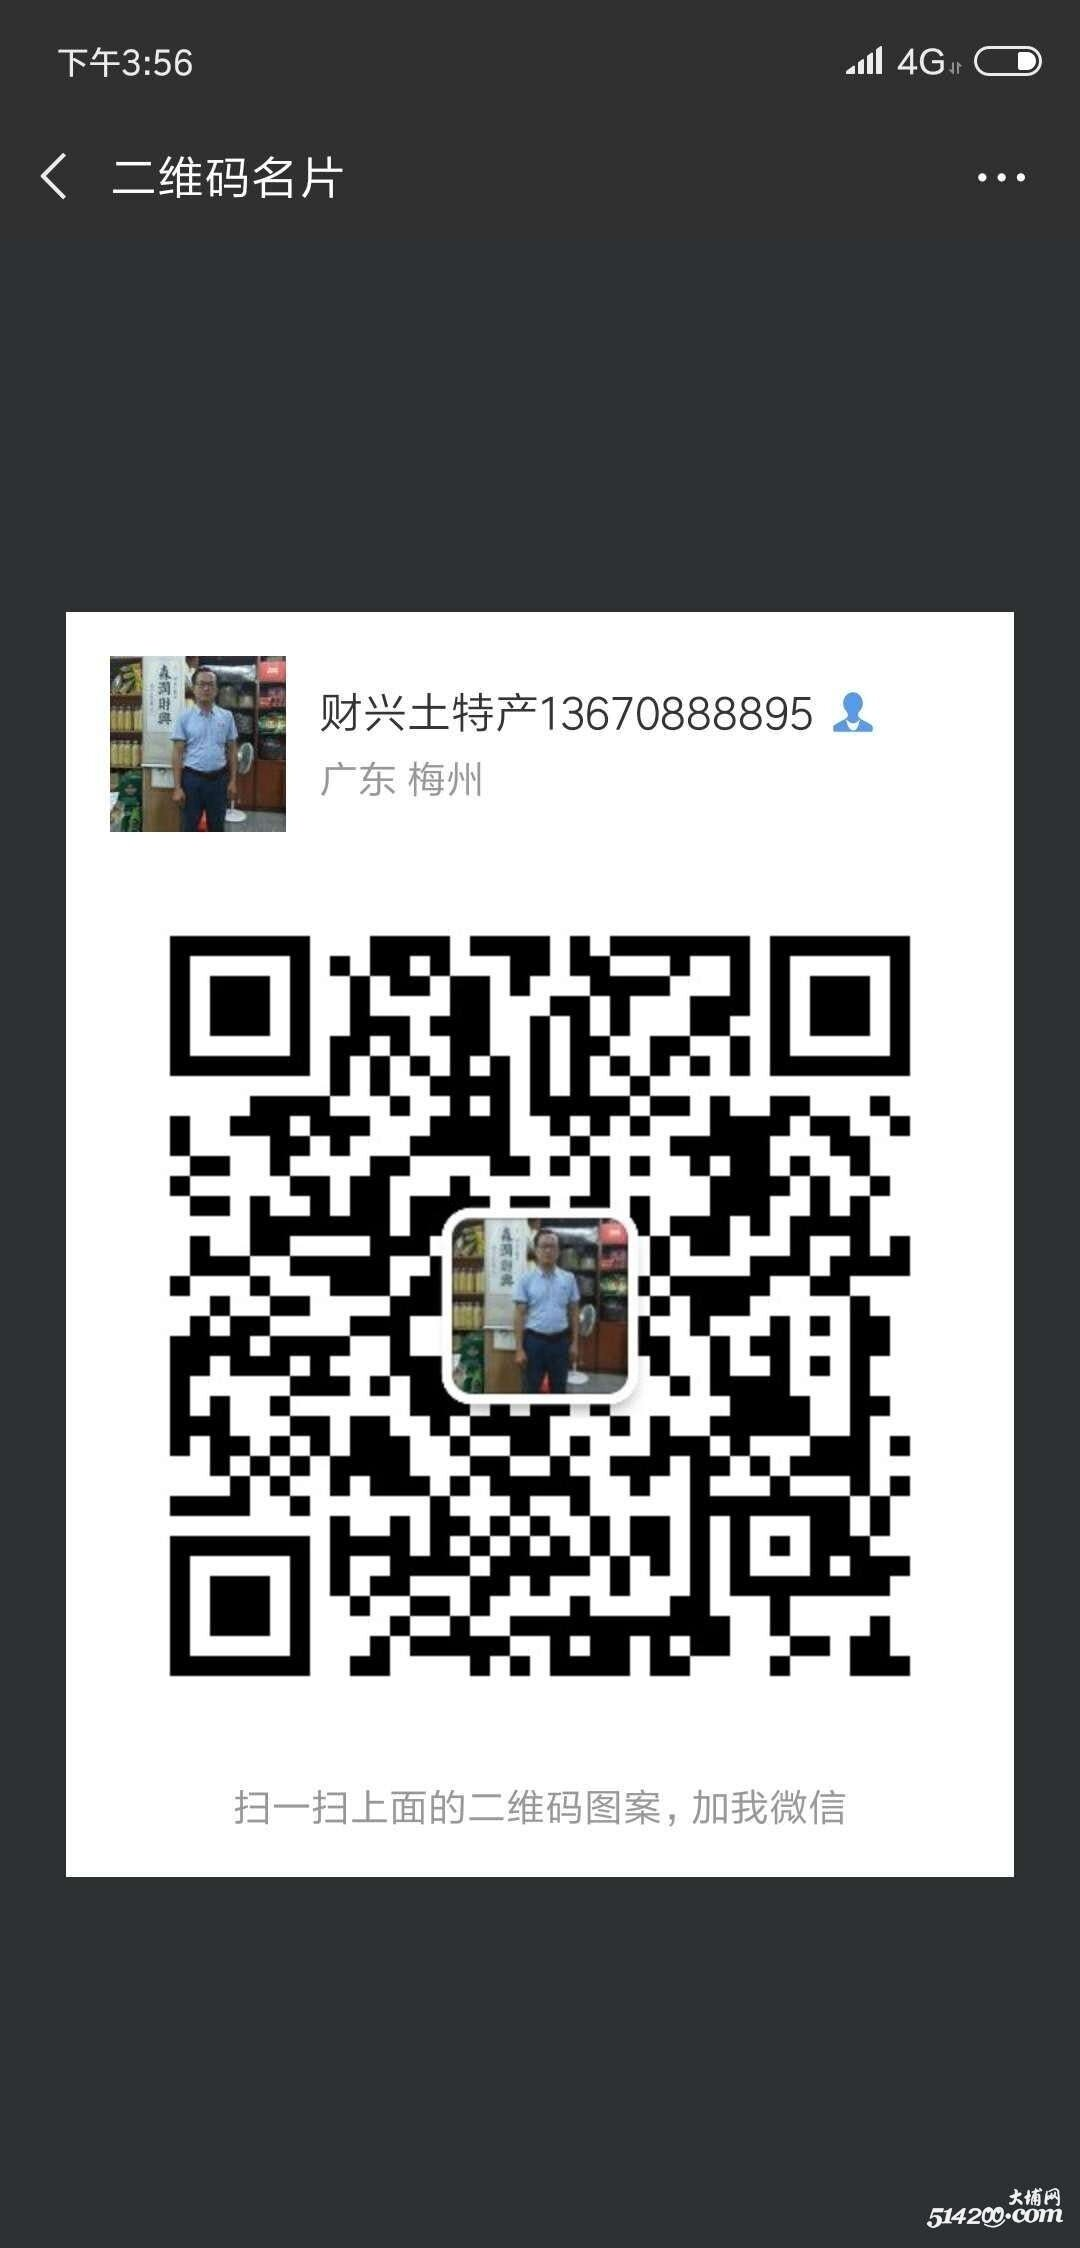 wechat_upload15530624685c91da449977b